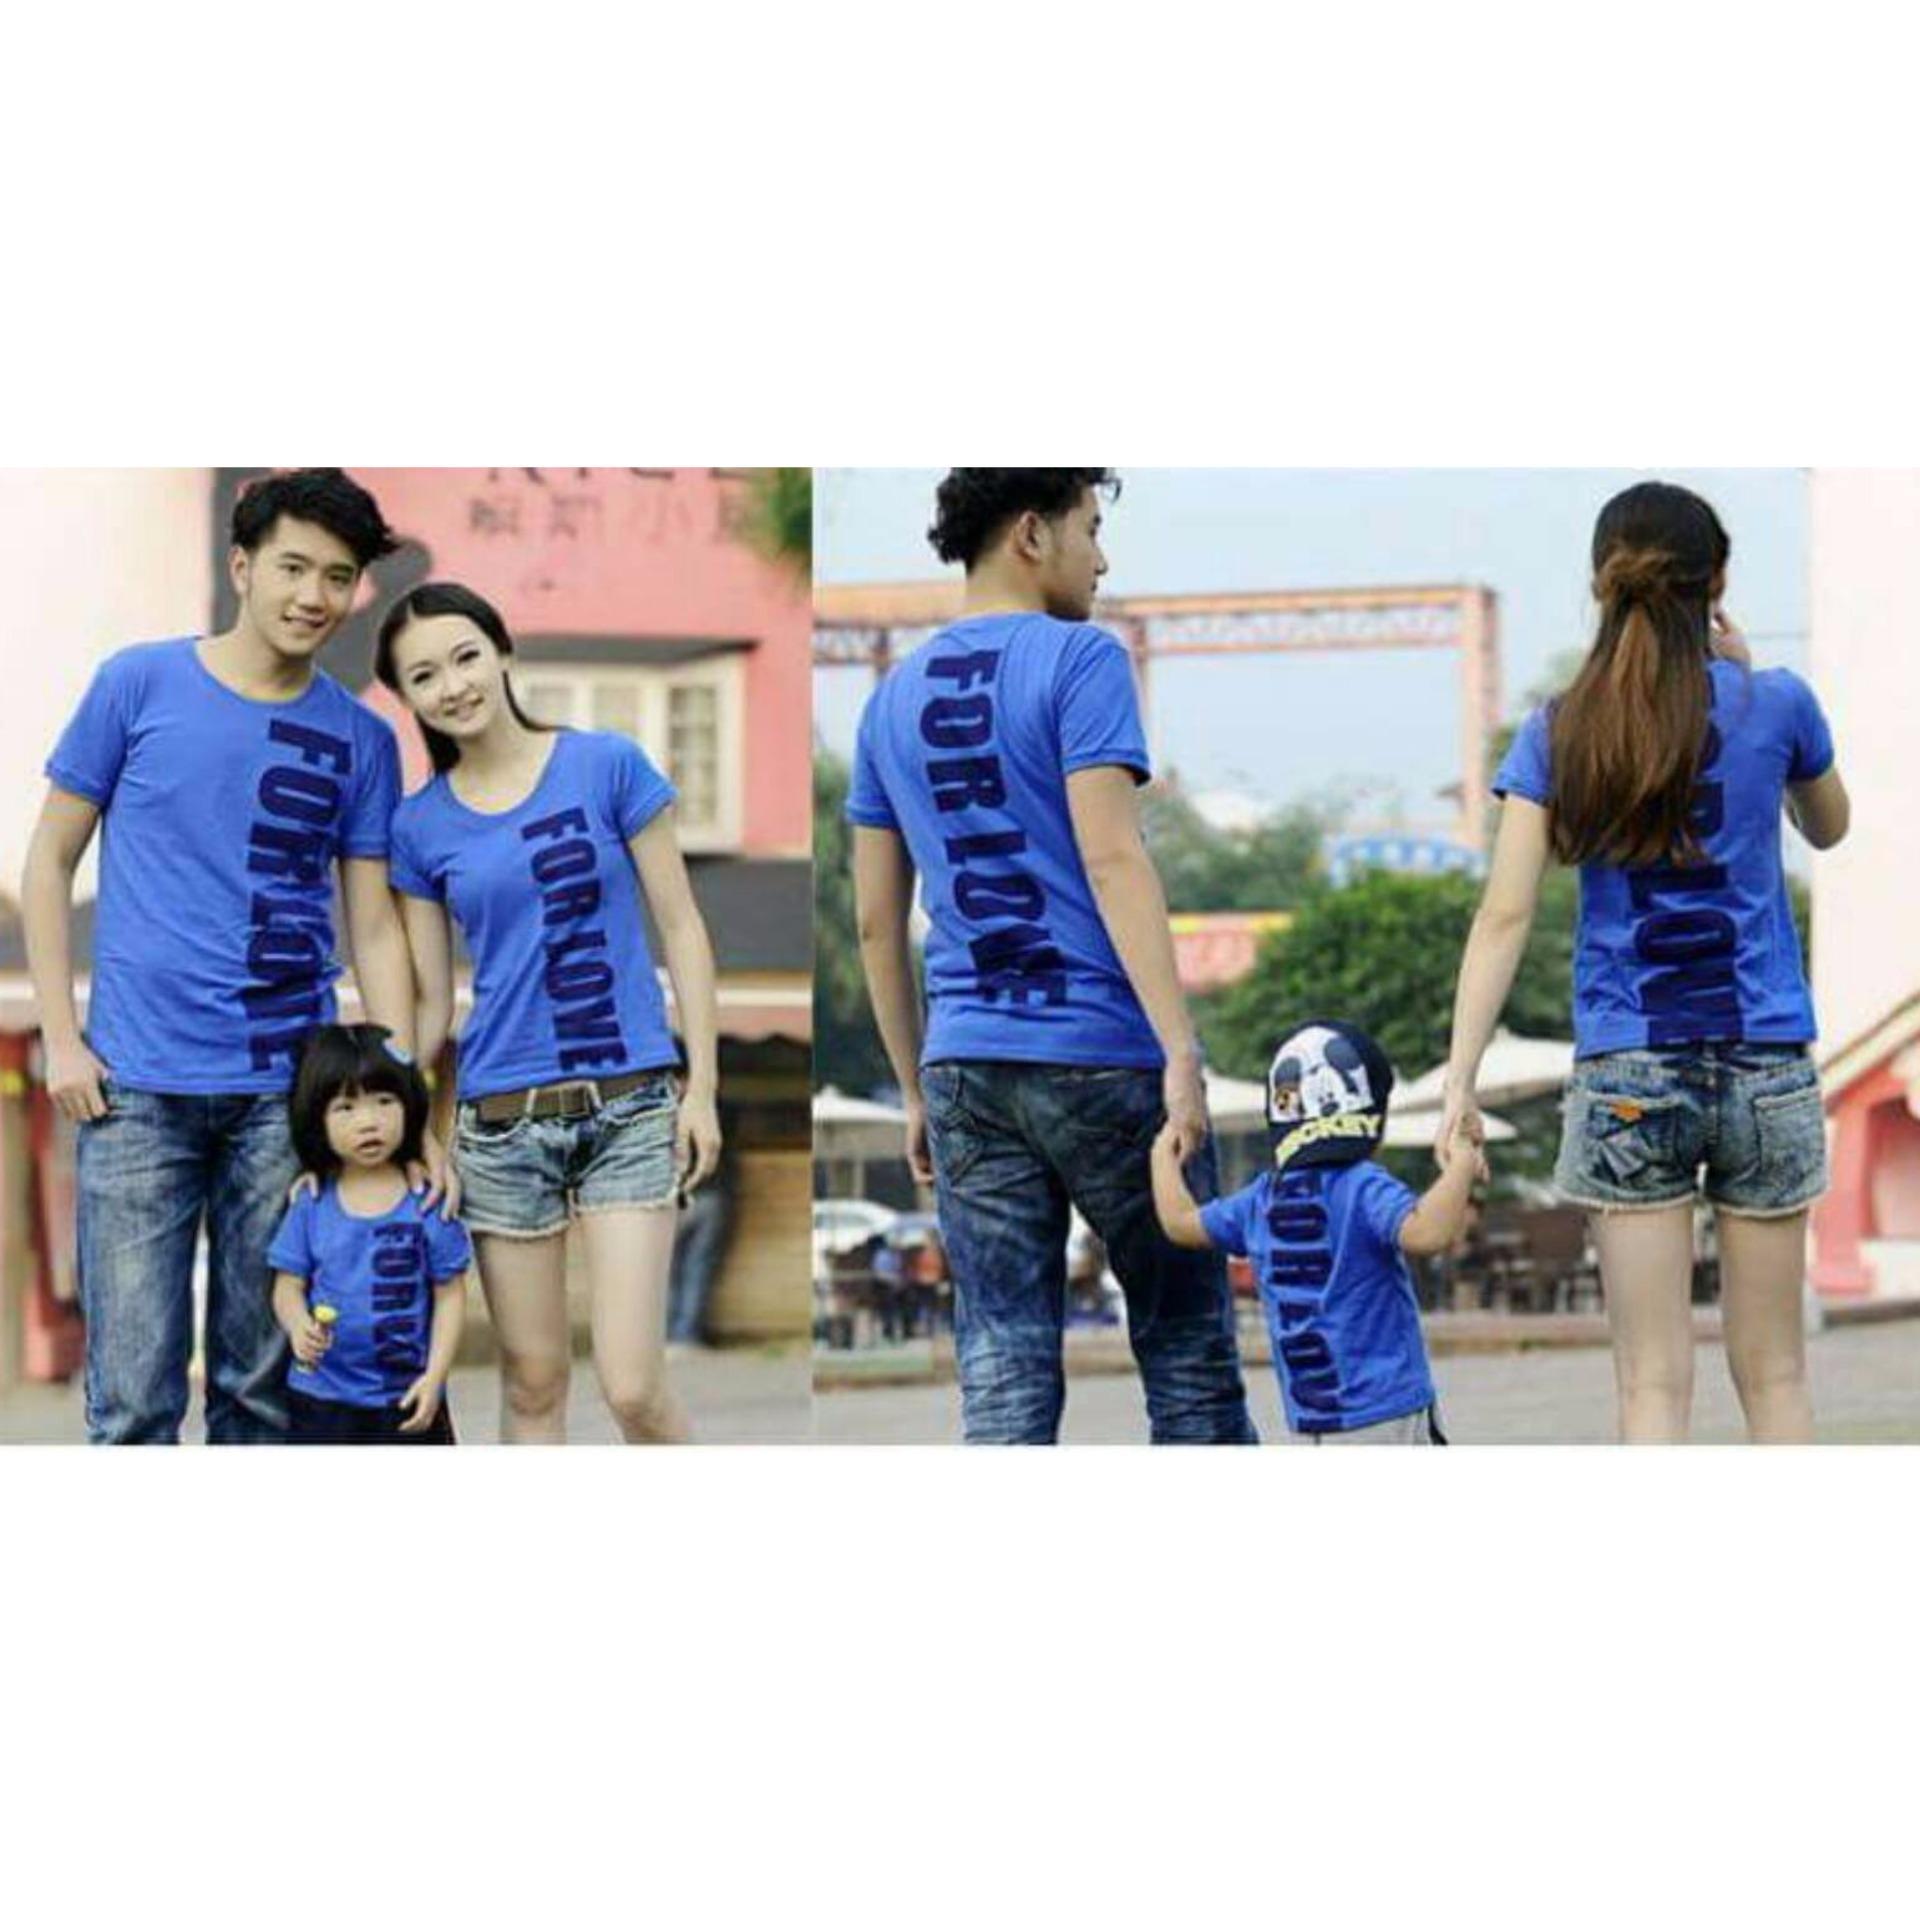 Couple Store Cs Kaos Keluargat Shirt Family Ayah Bunda Anak Minion Source · Anak Ayah Bunda. Source · Shock Price legiONshop-Kaos keluarga/T-shirt Family ...